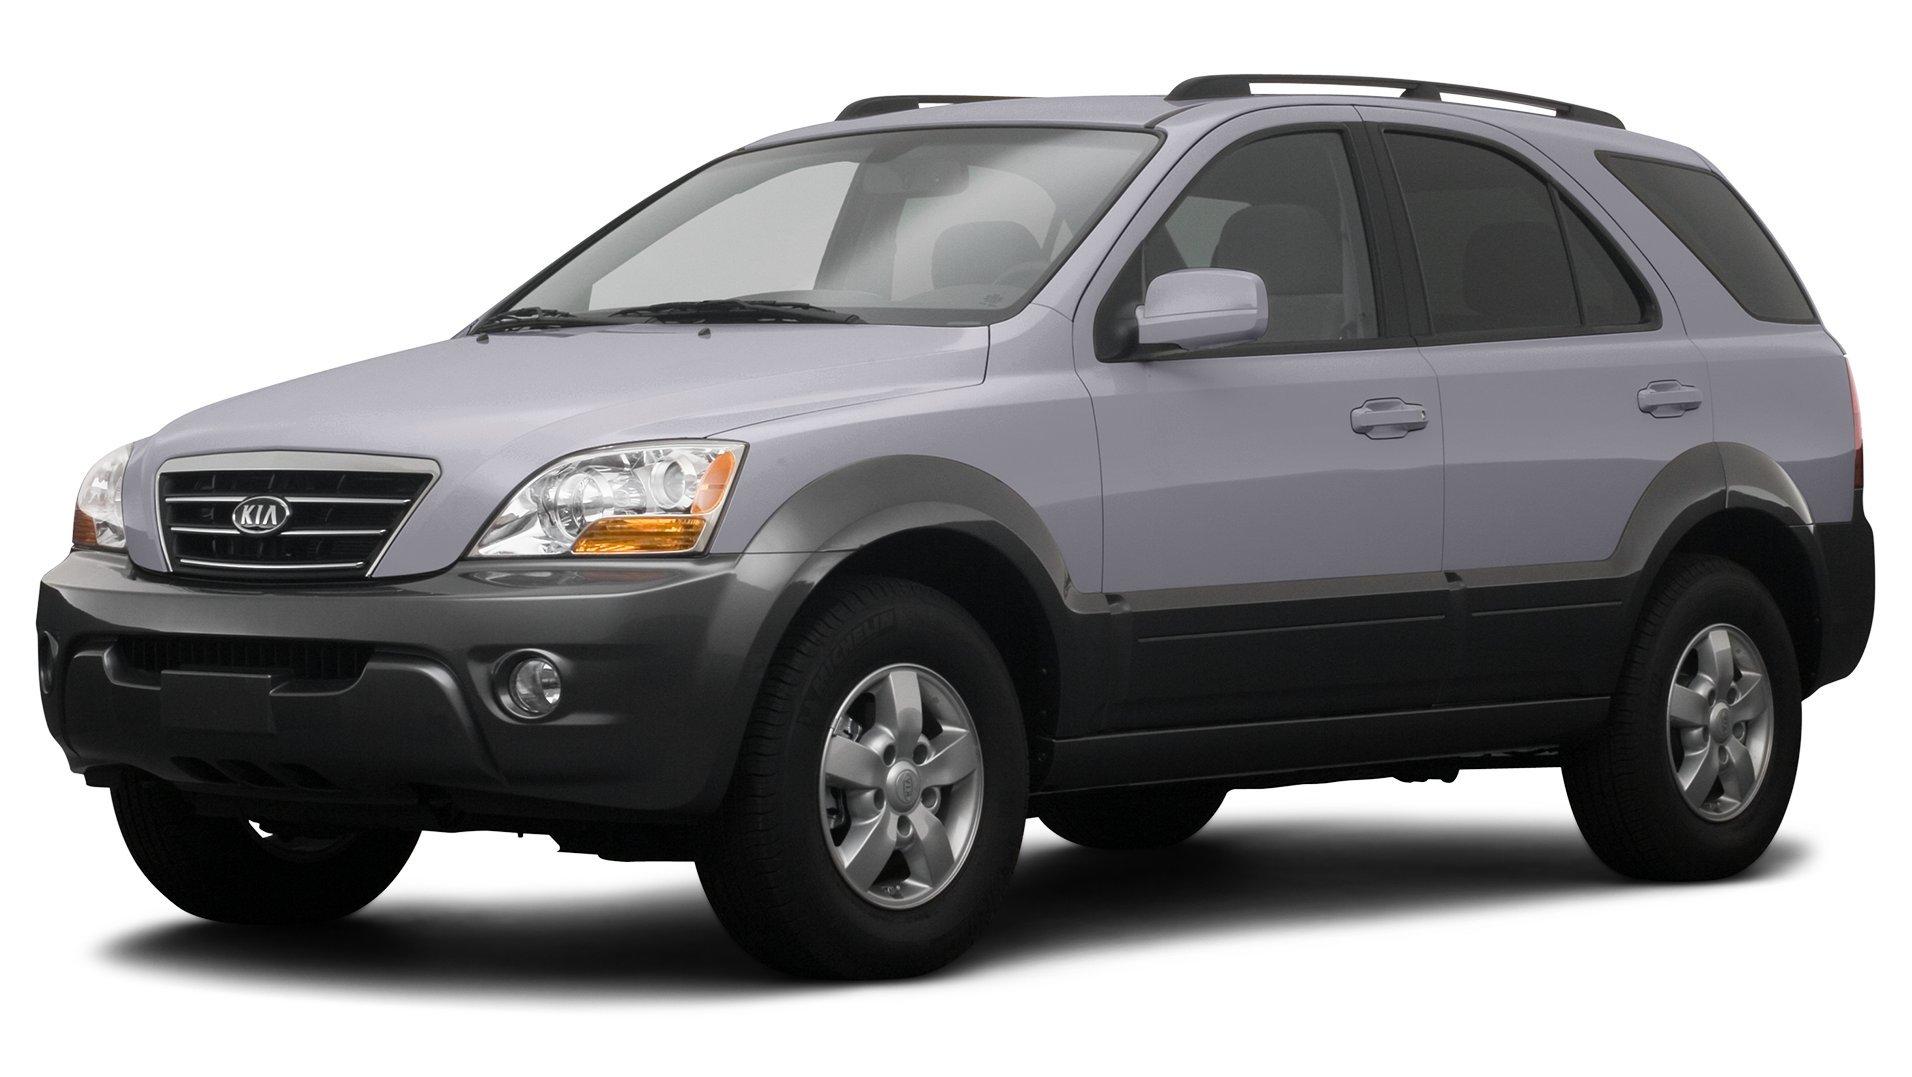 2008 Kia Sorento Reviews Images And Specs Vehicles 2 0 Engine Diagram Wheel Drive 4 Door Base